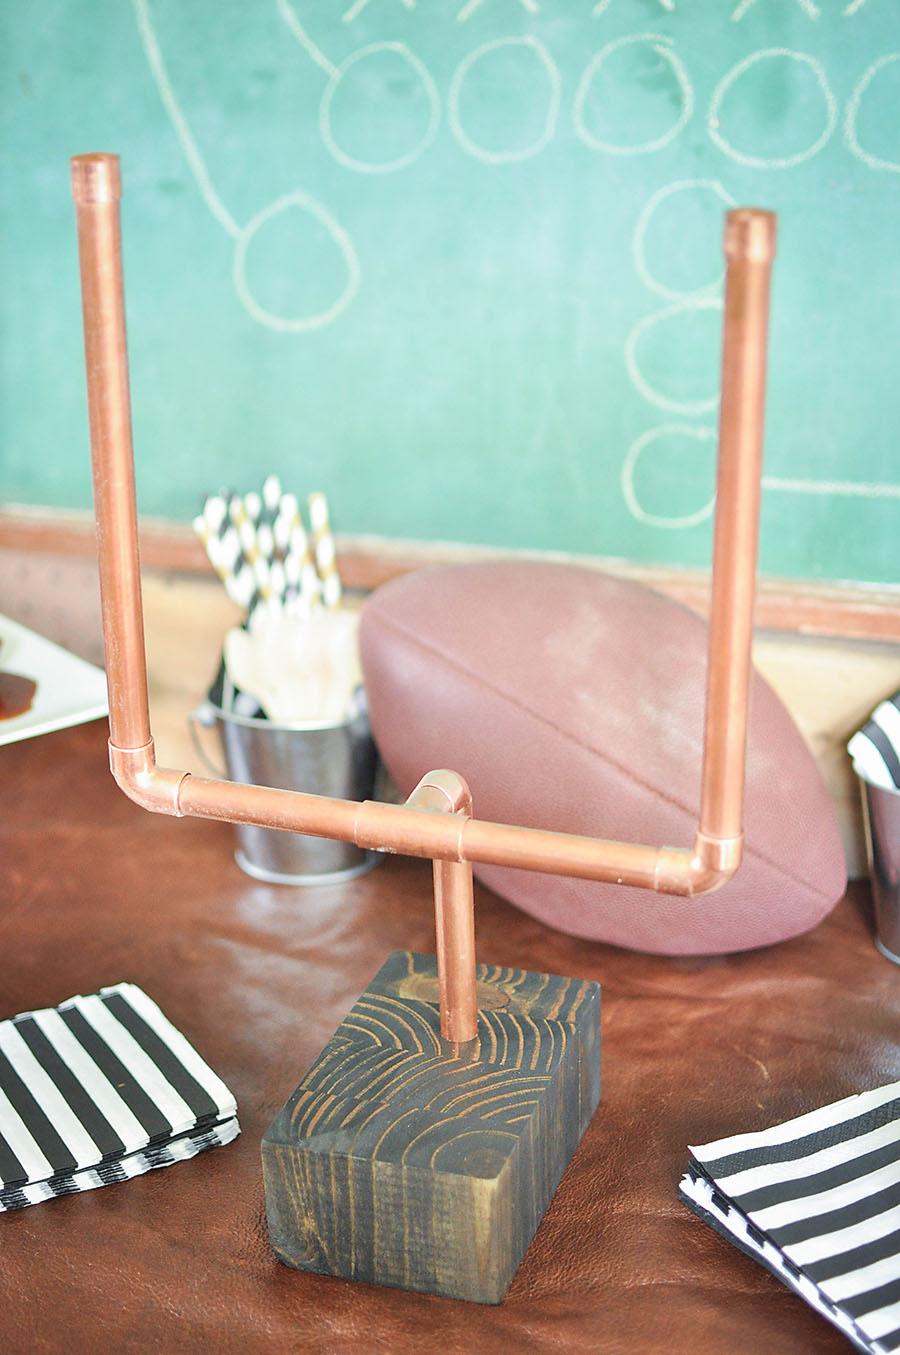 DIY Copper Pipe Mini Football Goalposts - Wit & Wander